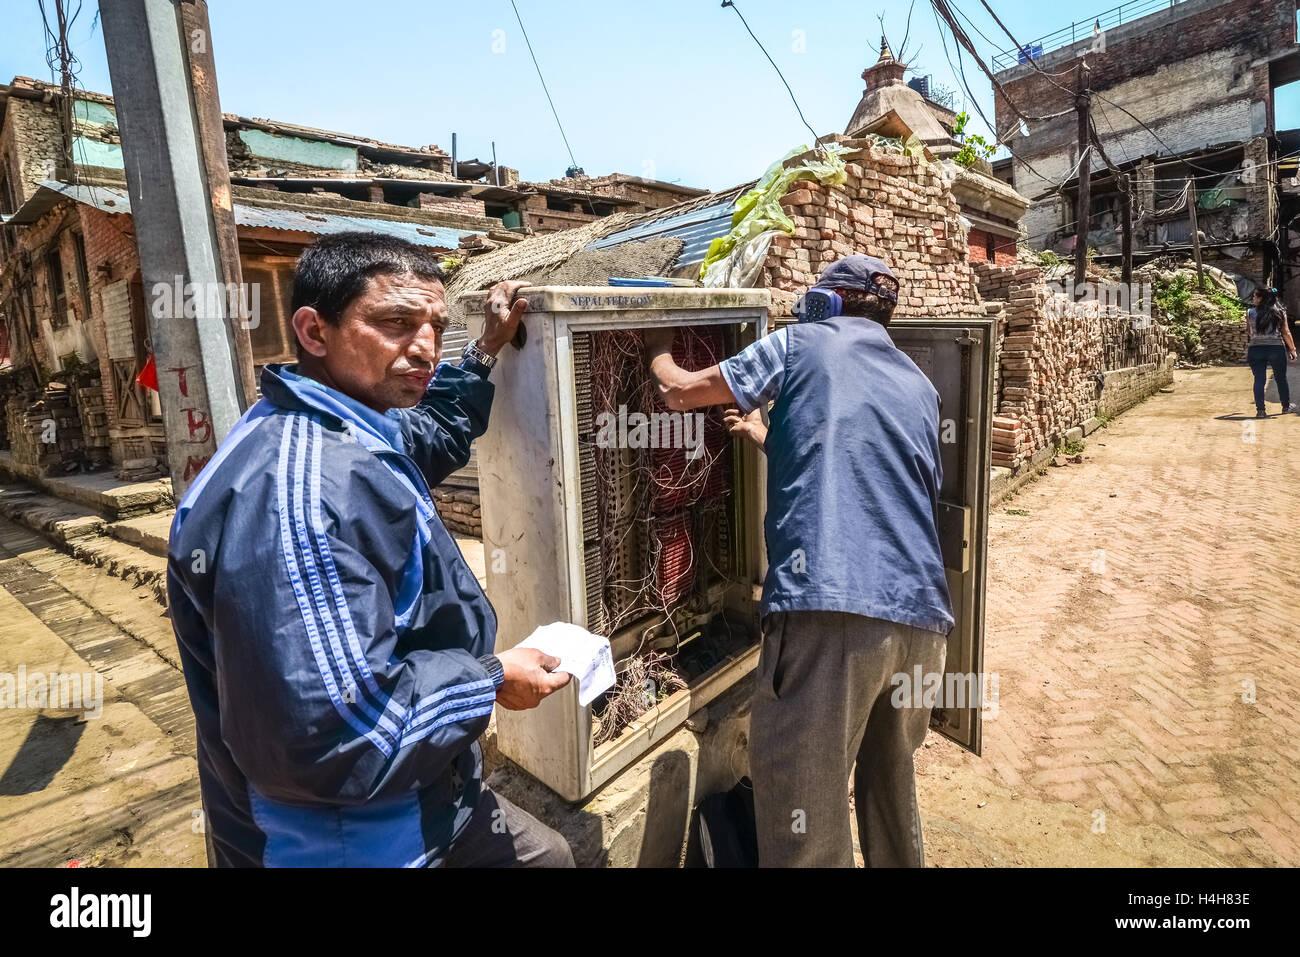 Technicians doing maintenance work on telephone network in Bhaktapur, Nepal. - Stock Image